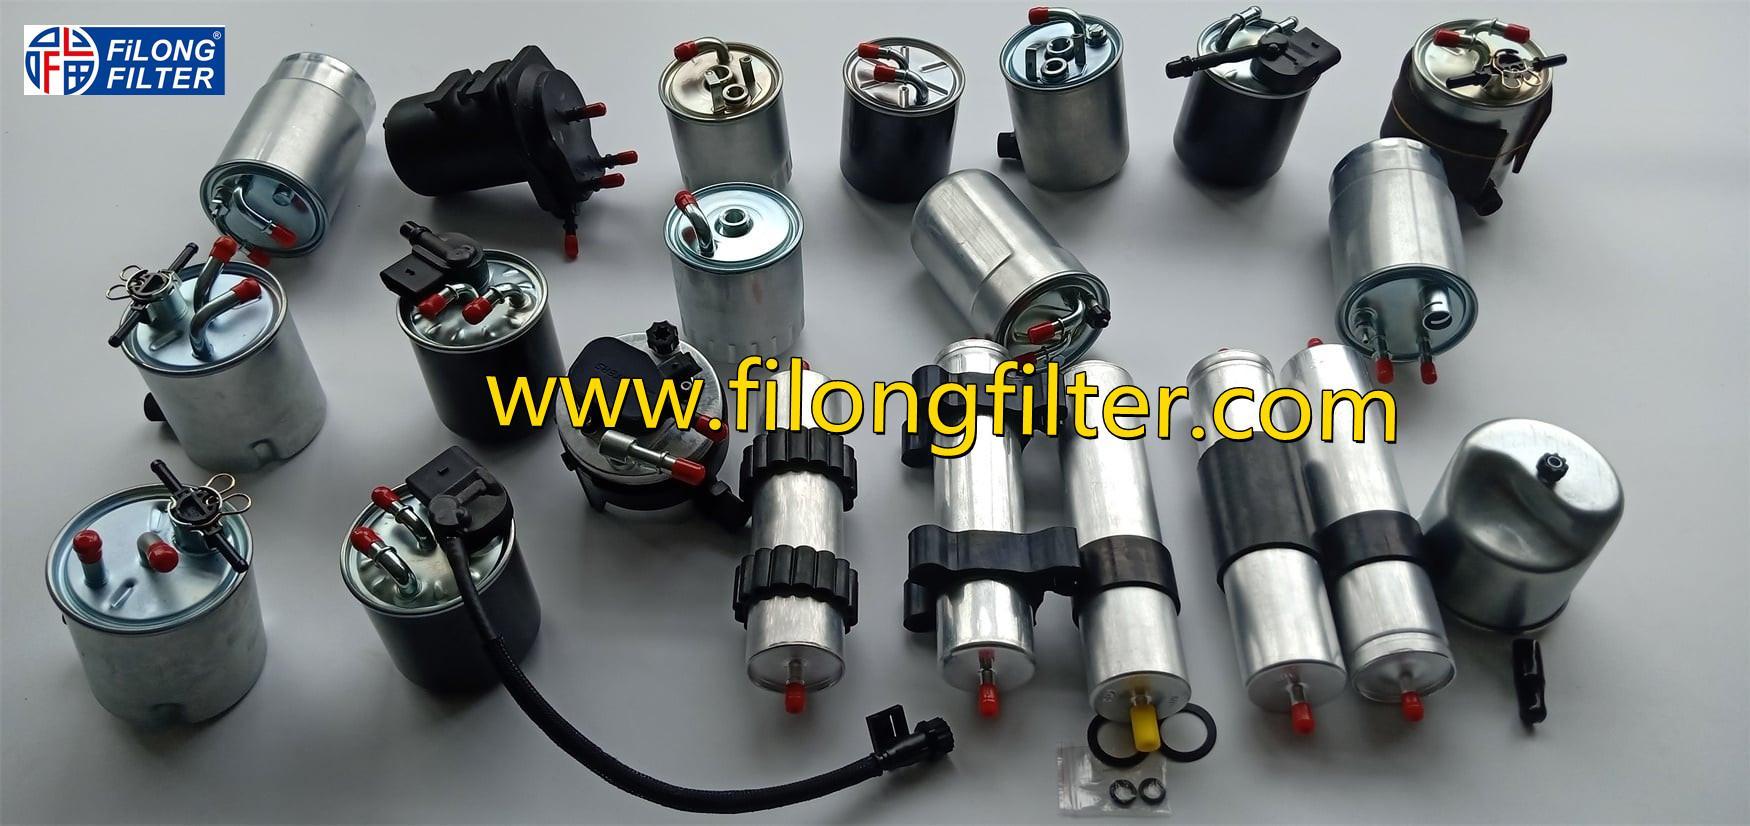 FILONG Filter Manufactory Supplier MANN Fuel Filter PL420X, FS19769,PP967/1,H710WK, KC296D,ST6057   FILONG Automotive filters Manufacturers in China,,FILONG Automotive filters  Factory In China,FILONG Automobile filters  Suppliers In China, Transmission Filter Manufacturers in china,Transmission Filter factory in china,, Transmission filters manufactory in china,China Transmission filter supplier, Fuel Filter Manufacturers in china,Fuel Filter factory in china,,Fuel filters manufactory in china,China Fuel filter supplier,  Element Oil Filter Manufacturers in china, Element Oil Filter factory in china,,  Element Oil Filter manufactory in china,China  Element Oil Filter supplier,  Element Fuel Filter Manufacturers in china,  Element Fuel Filter factory in china,,   Element Fuel Filter manufactory in china,China   Element Fuel Filter supplier,  ECO Oil Filter Manufacturers in china,  ECO Oil Filter factory in china,,   ECO Oil Filter manufactory in china,China   ECO Oil Filter supplier,  ECO Fuel Filter Manufacturers in china,  ECO Fuel Filter  factory in china,,   ECO Fuel Filter  manufactory in china,China   ECO Fuel Filter supplier, Aluminum material Fuel Filter Manufacturers in china,  Aluminum material Fuel Filter  factory in china,,   Aluminum material Fuel Filter  manufactory in china,China   Aluminum material Fuel Filter supplier, Intank Filter Manufacturers in china,Intank Fuel Filter factory in china,Intank Filter manufactory in china,China Intank Fuel Filter supplier, JKT Carbon Filter For Air Conditioner Manufacturers in China, JKT Carbon Filter For Air Conditioner factory in China,JKT Carbon Filter For Air Conditioner Suppliers In China,